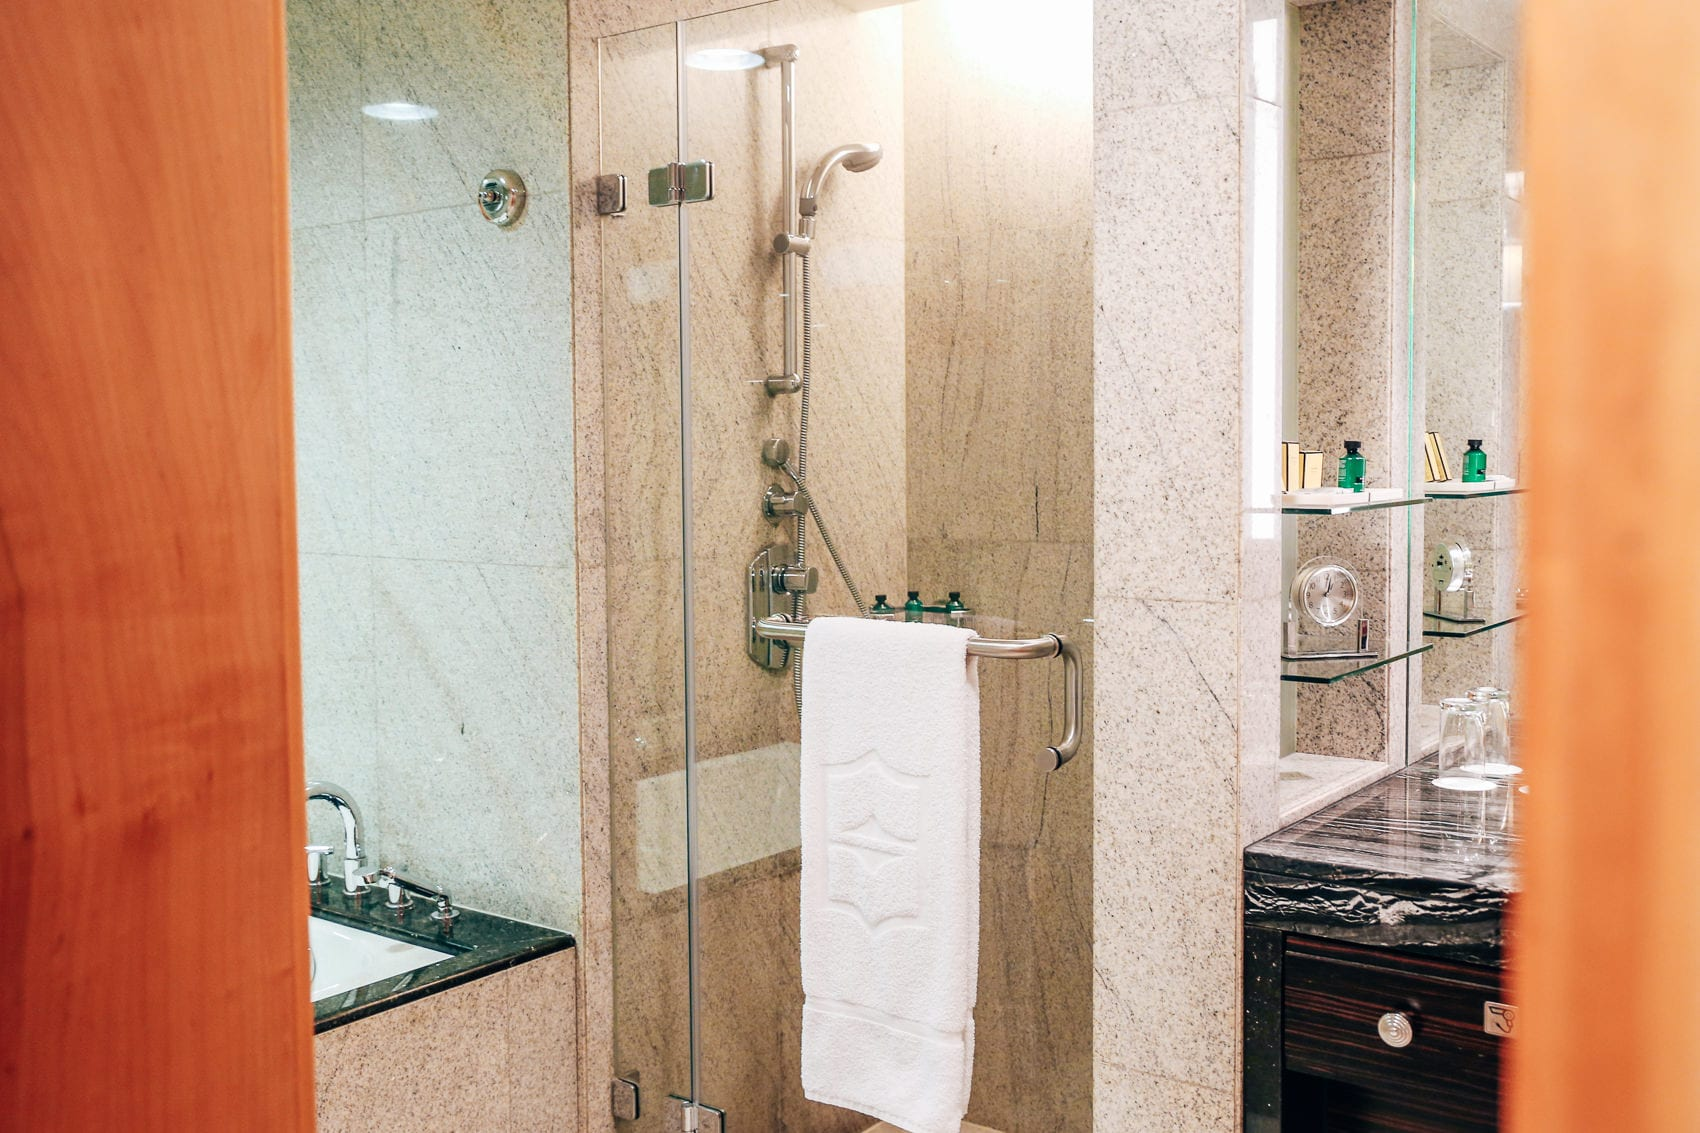 luxushotel-shangri-la-dubai-zimmer-pool-mit-blick-auf-den-burj-khalifa-reiseblog-des-belles-choses 16